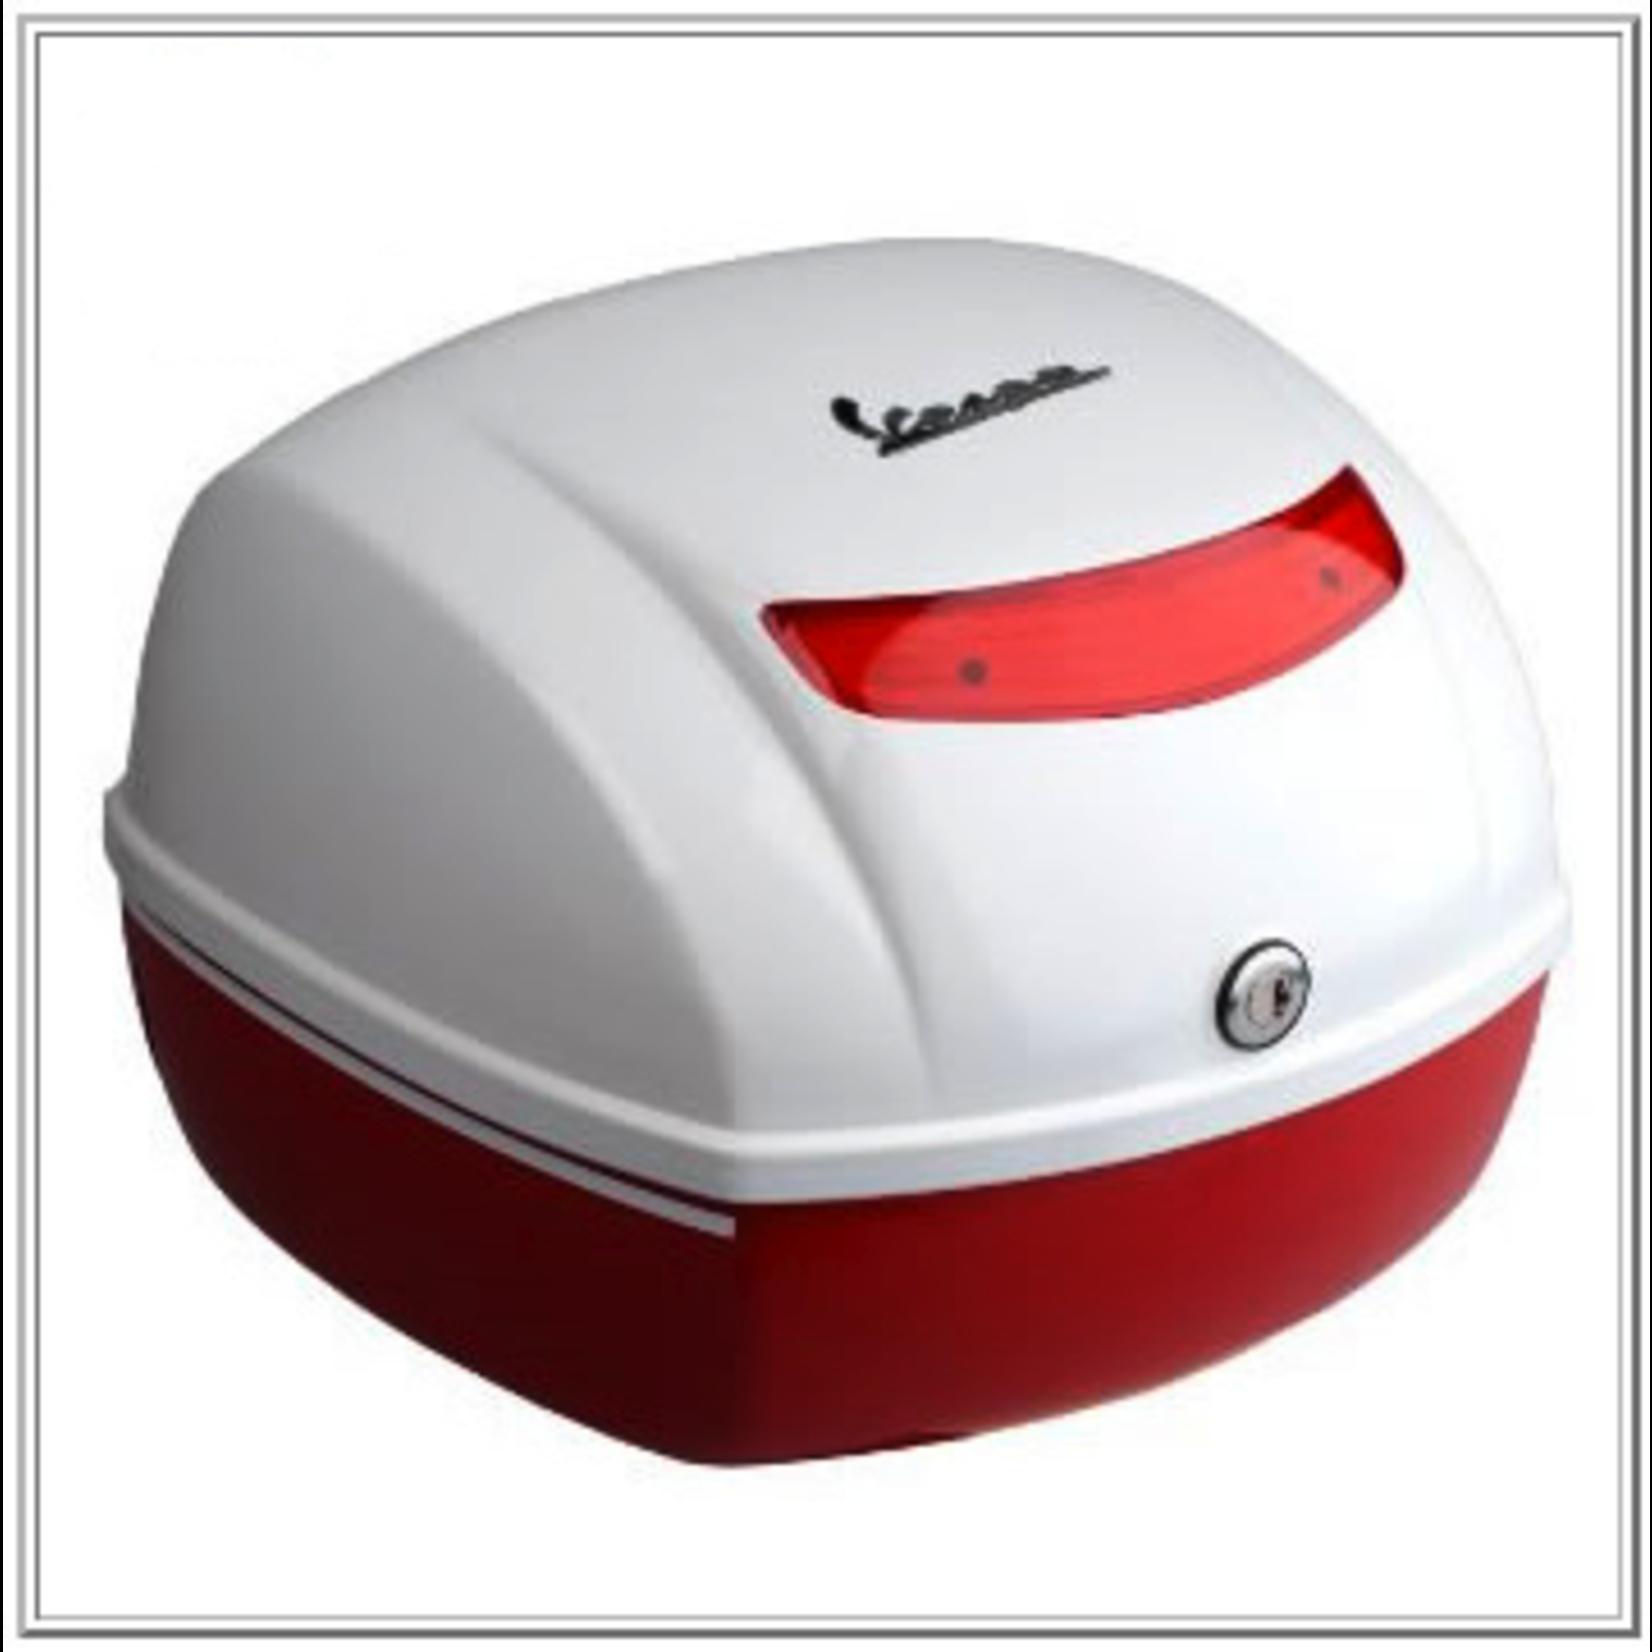 Accessories Top Case, S150 Red/White 2-Tone